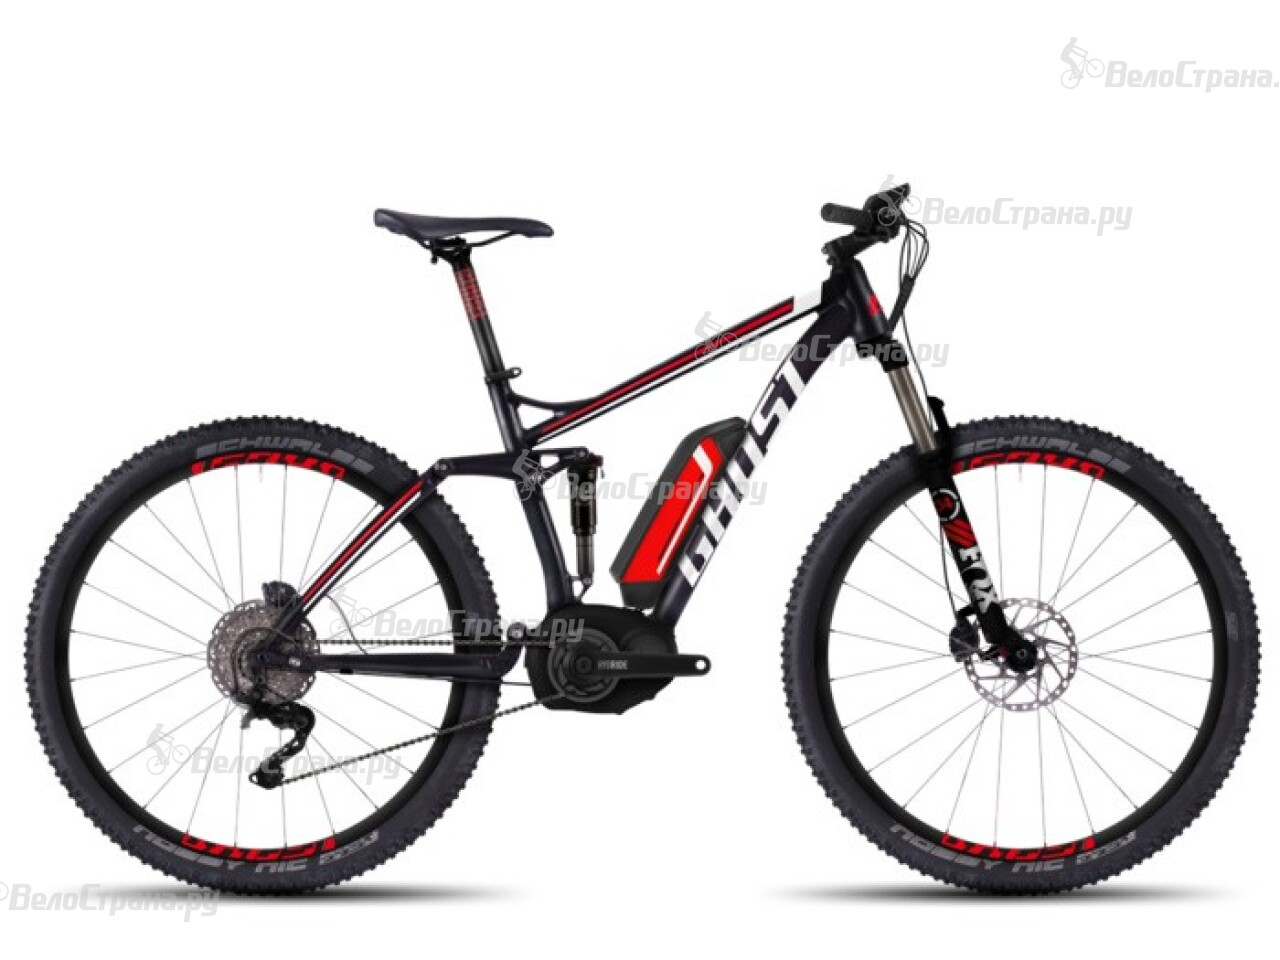 Велосипед Ghost Teru FS 7 (2016) велосипед challenger mission lux fs 26 черно красный 16